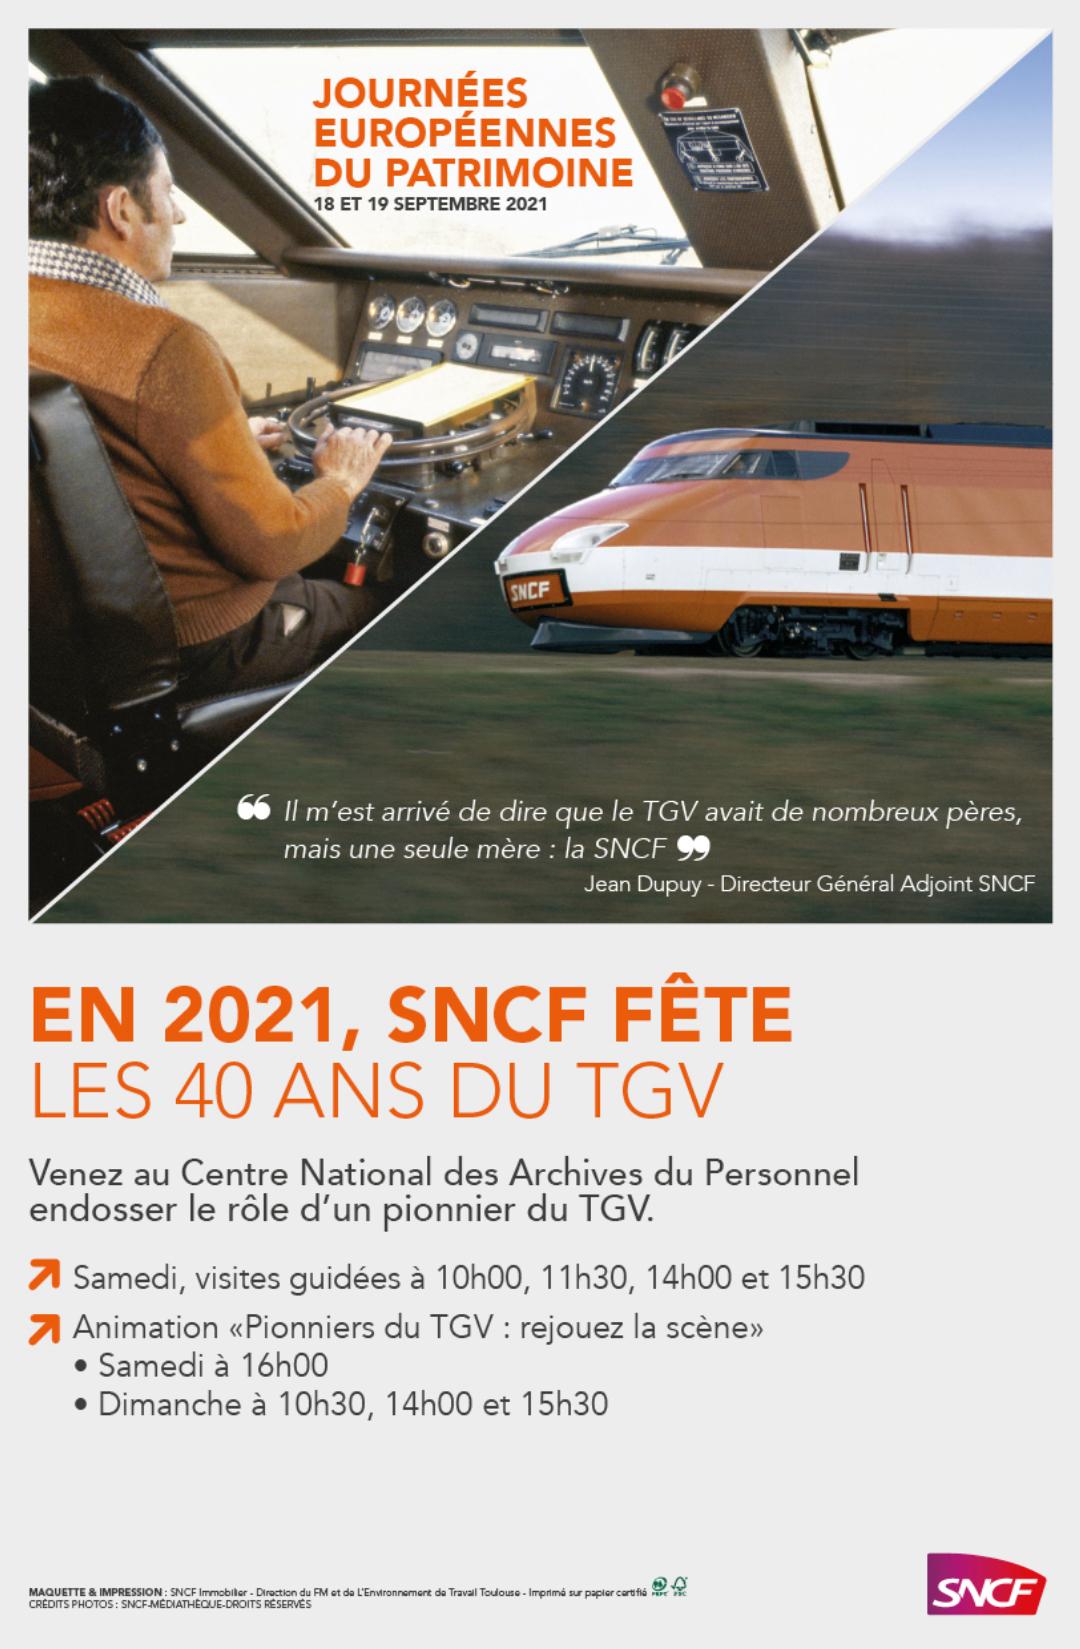 SARDO SNCF